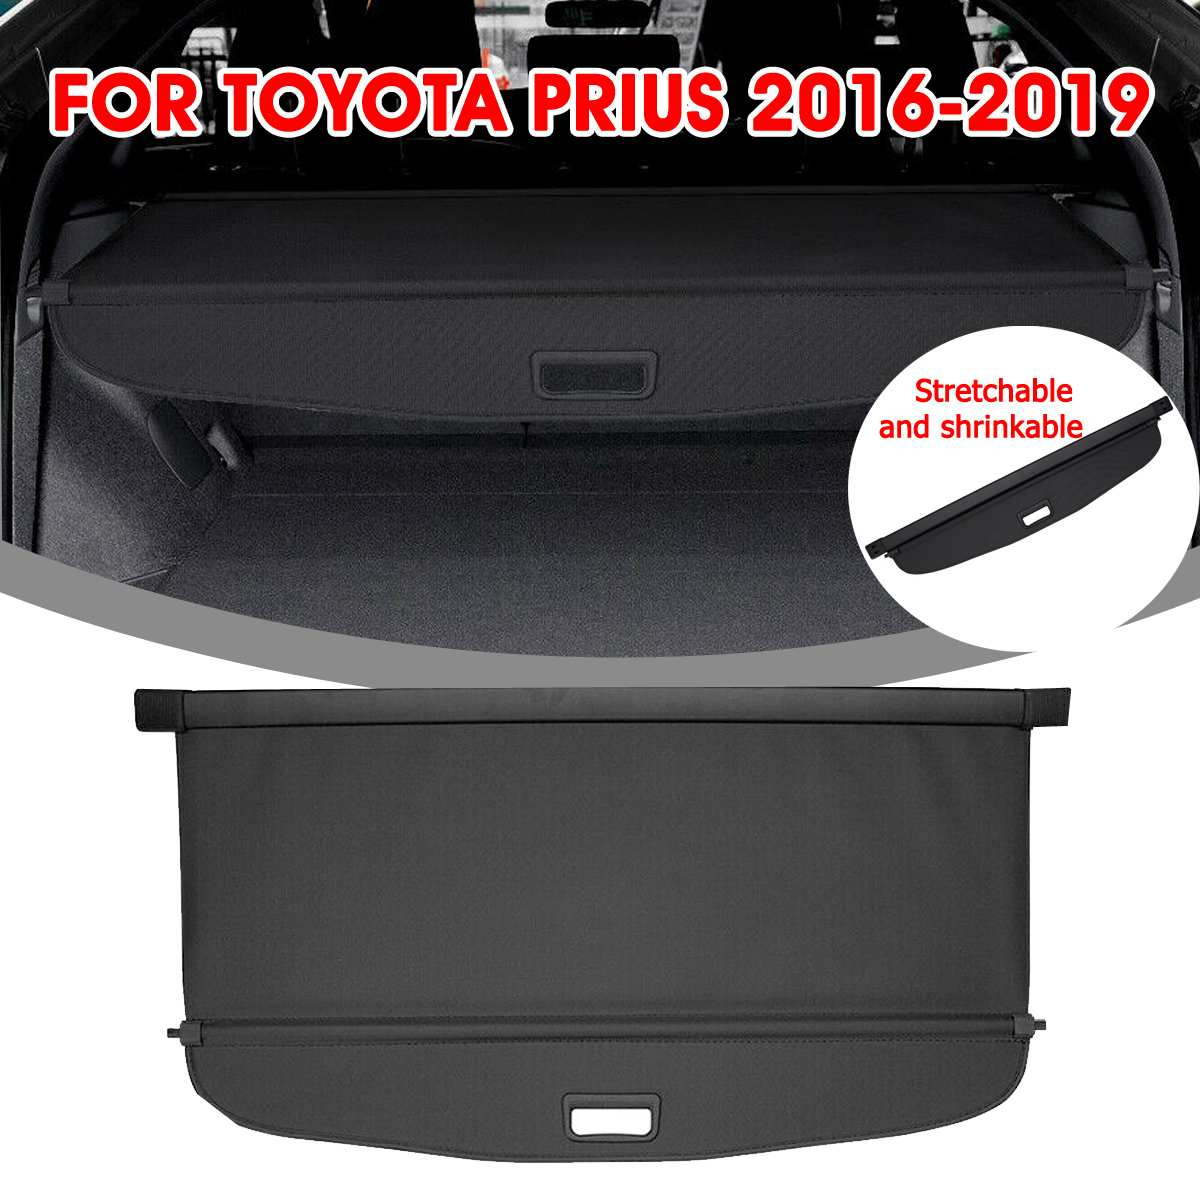 Audew For Toyota Prius 2016-2019 Car Trunk Shade Rear Security Cargo Cover Aluminum Auto Rear Cargo Screen Security Shield Shade